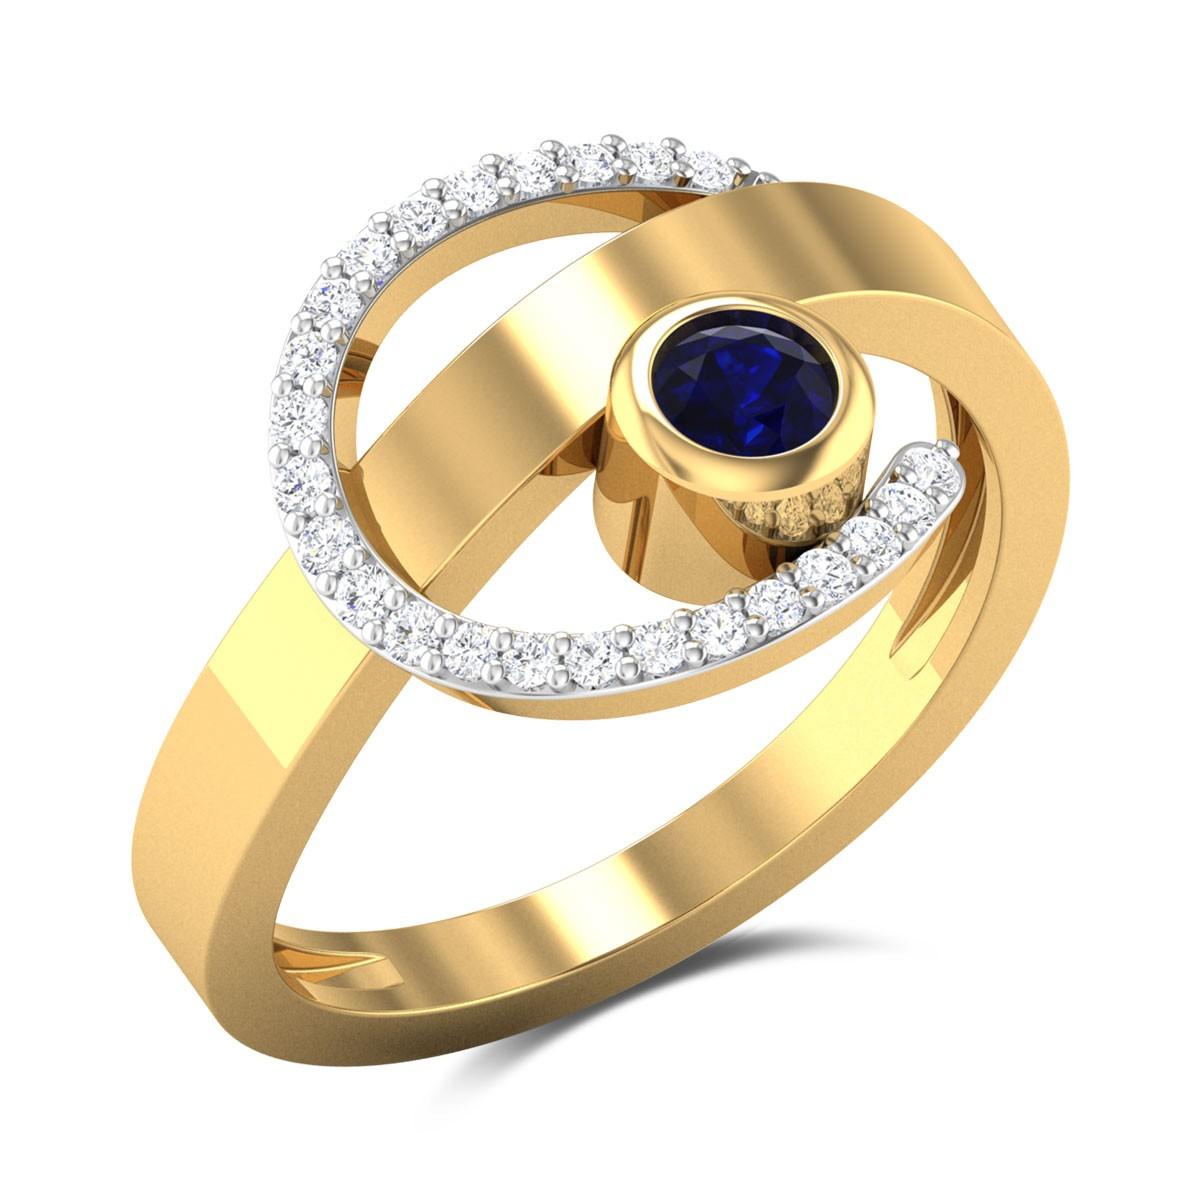 Larkspur Diamond Ring